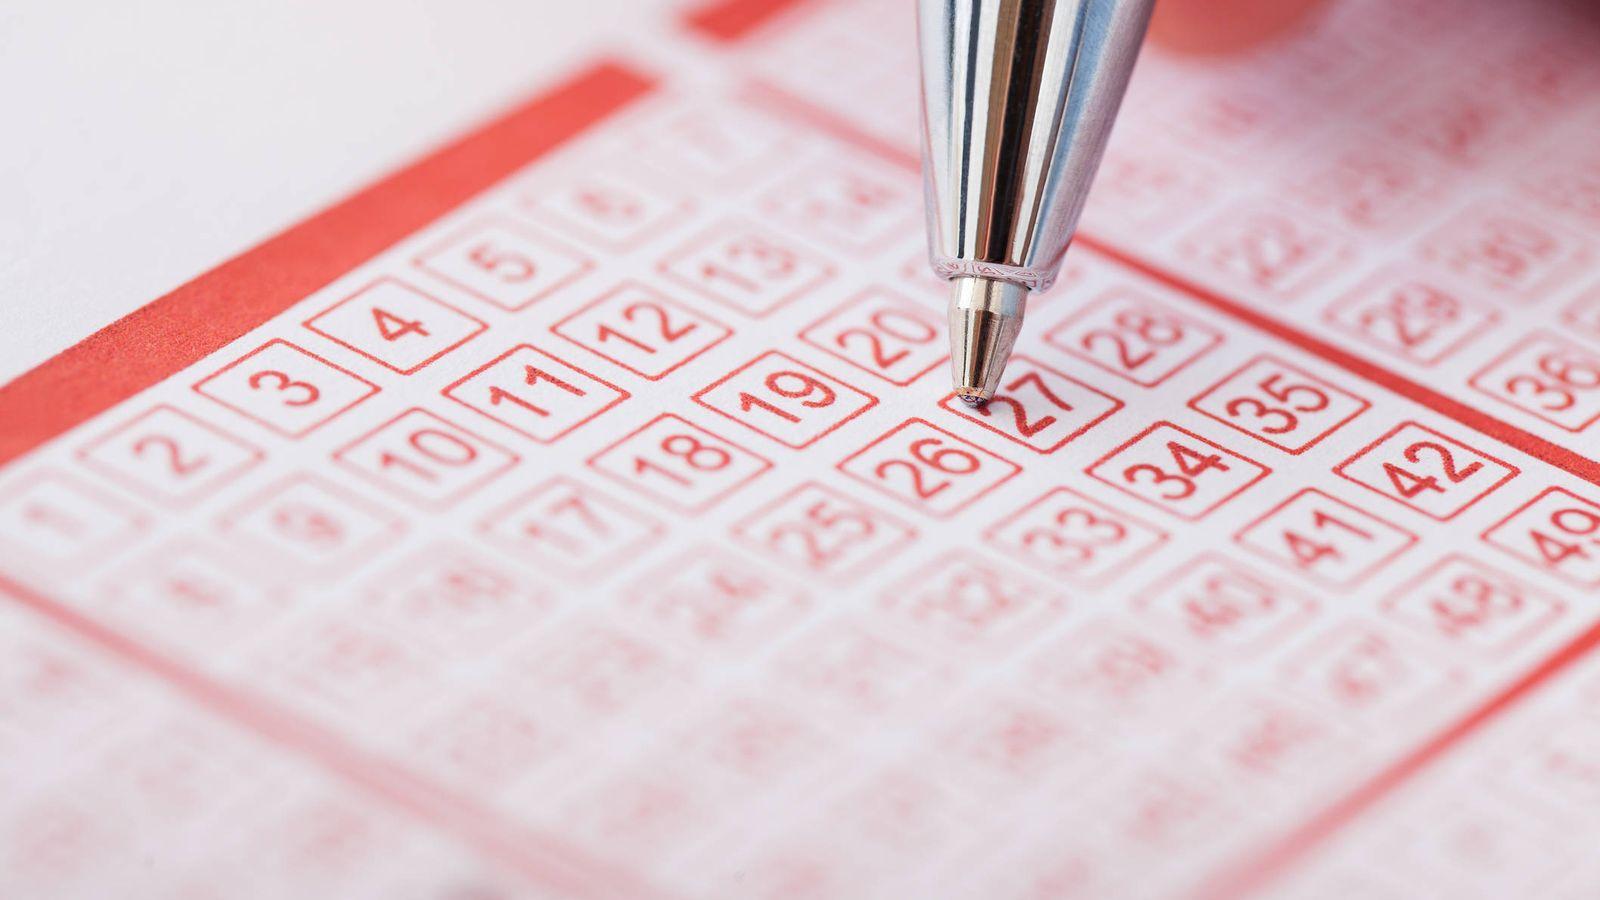 Foto: Un participante del sorteo de Euromillones rellena un boleto. (iStock)